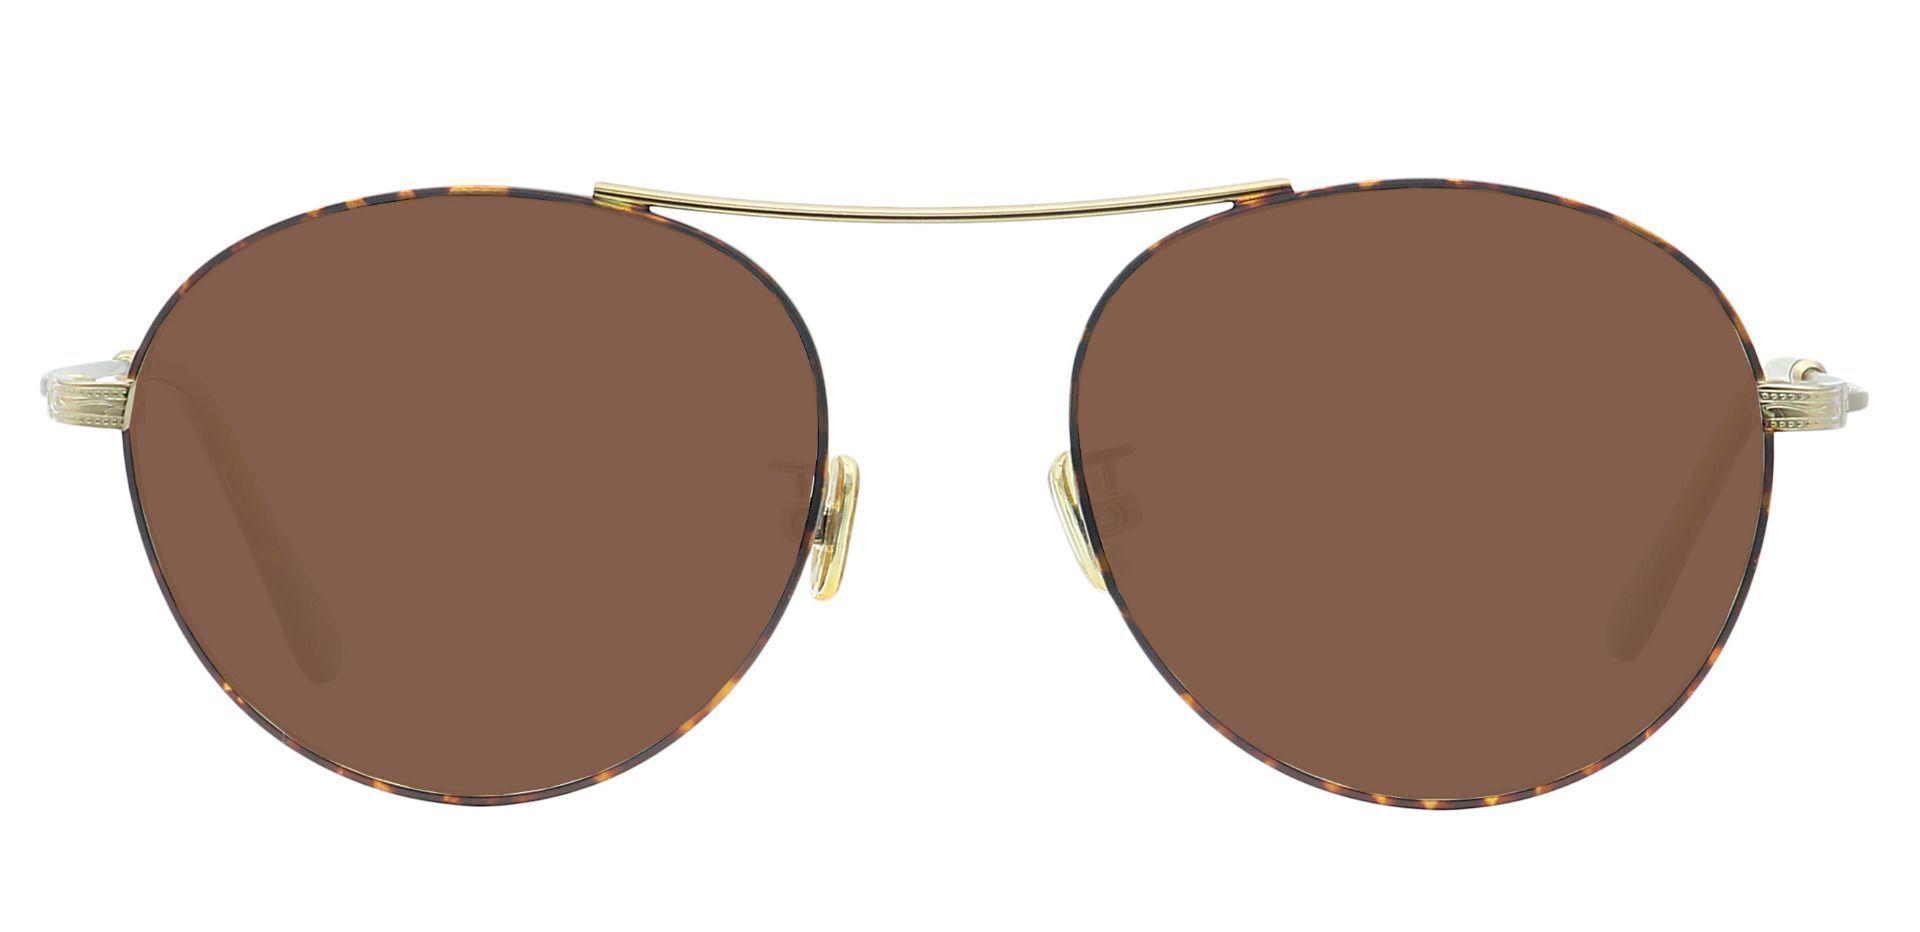 Finn Round Prescription Sunglasses - Yellow Frame With Brown Lenses